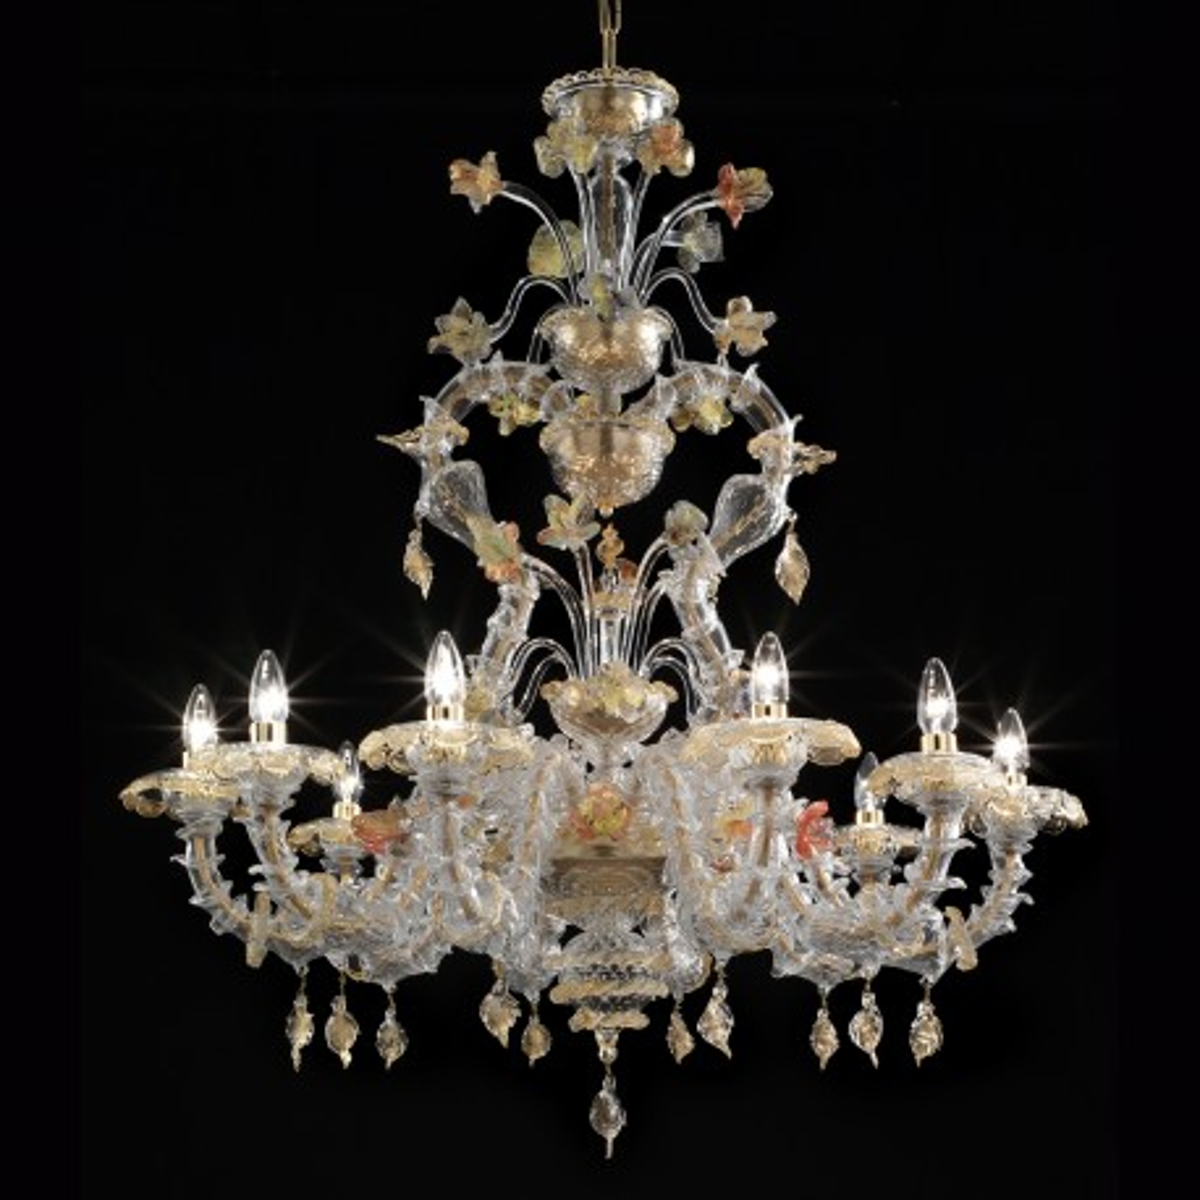 Fondaco 10 flammig Murano Kronleuchter - transparent Gold vielfarbig